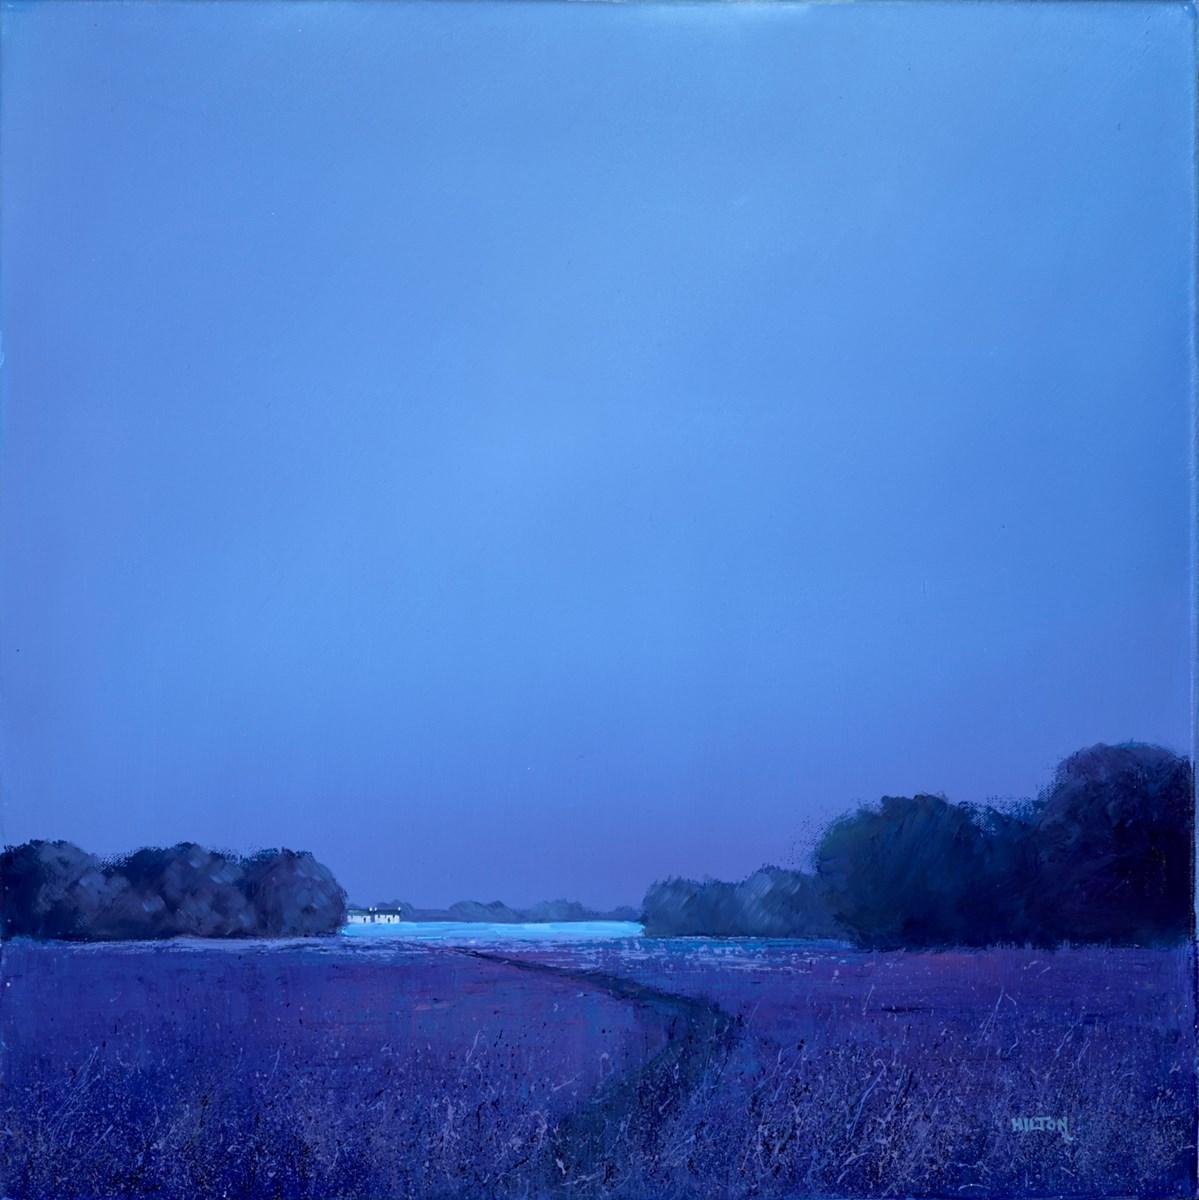 Nighttime Lavenders